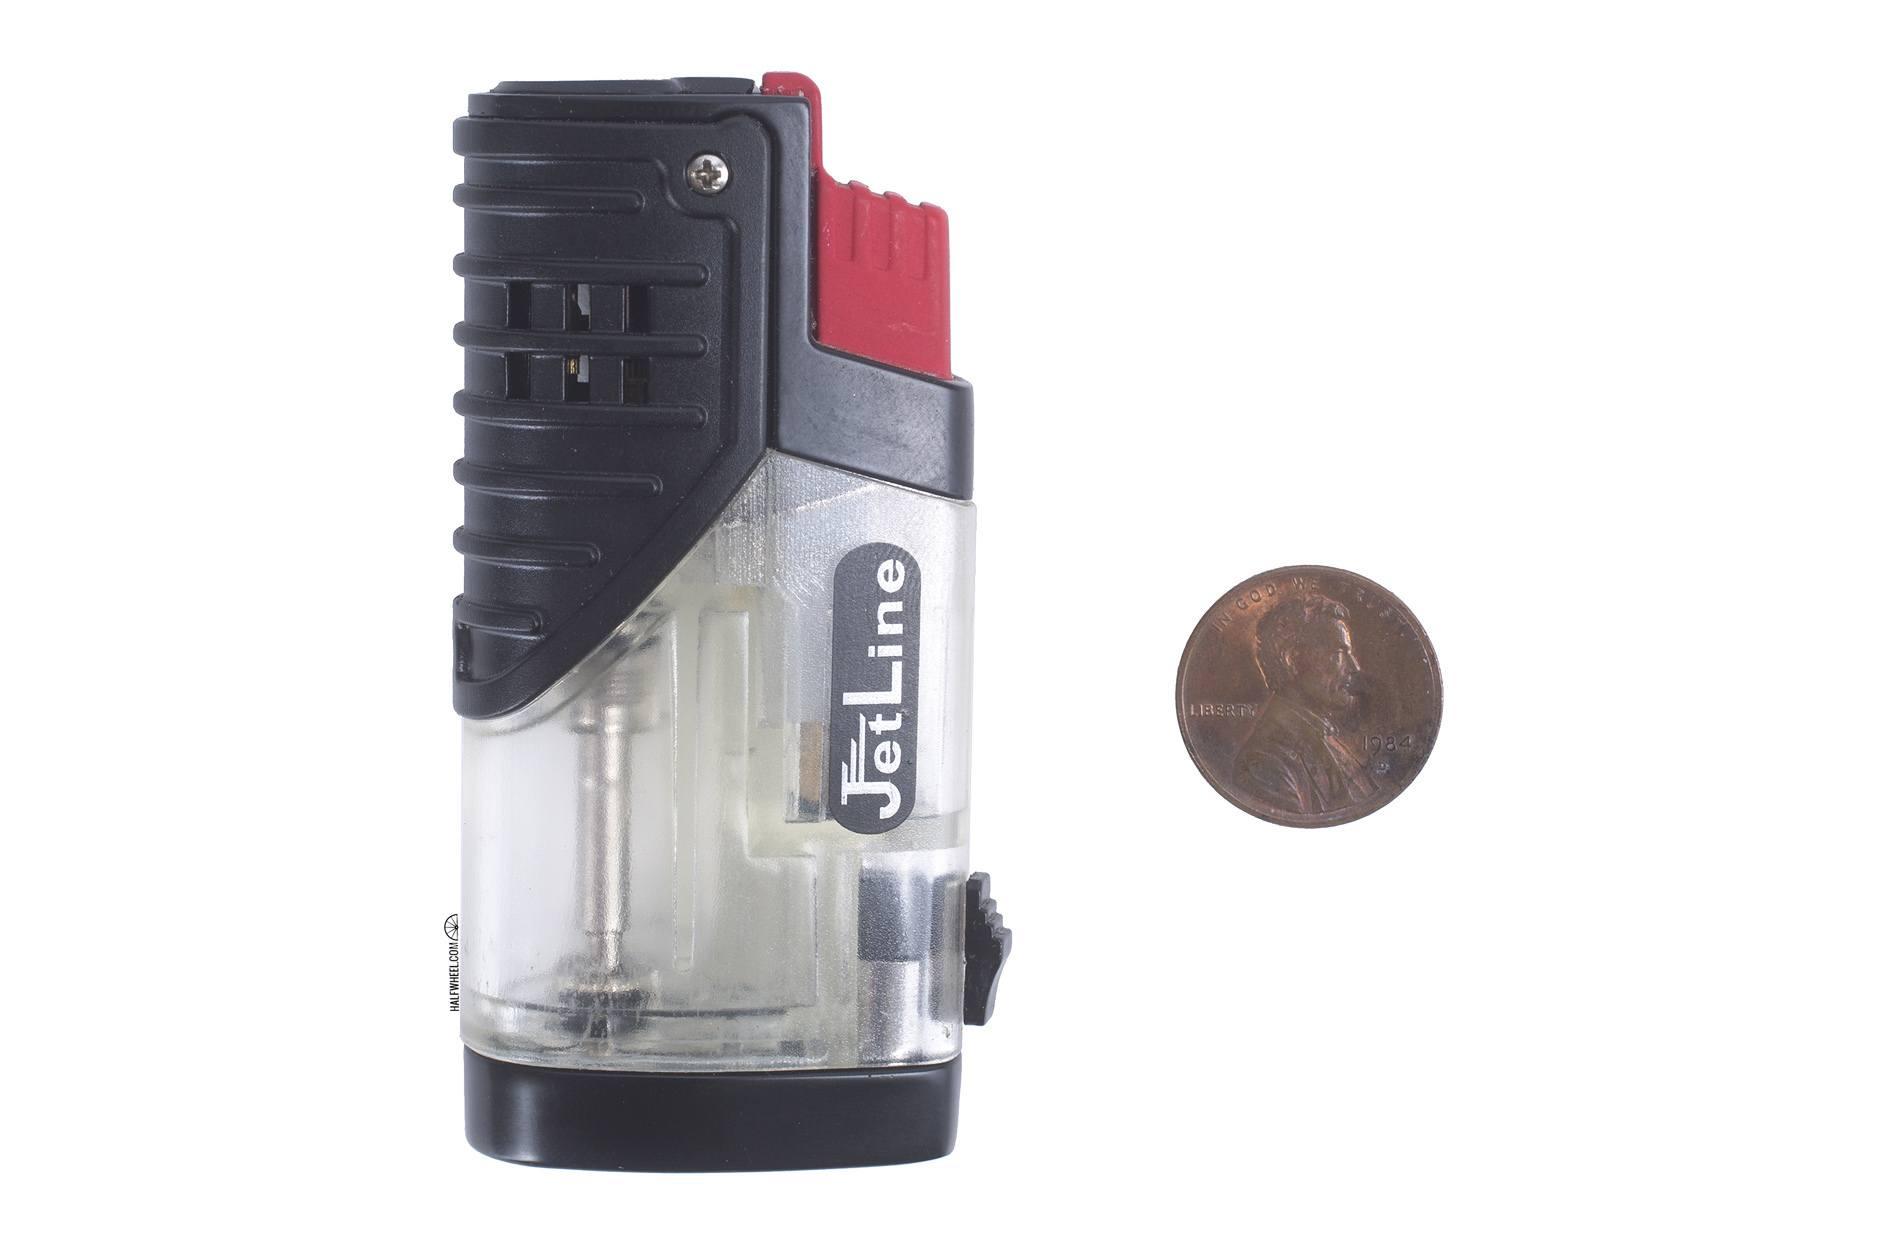 JetLine Patriot Lighter size